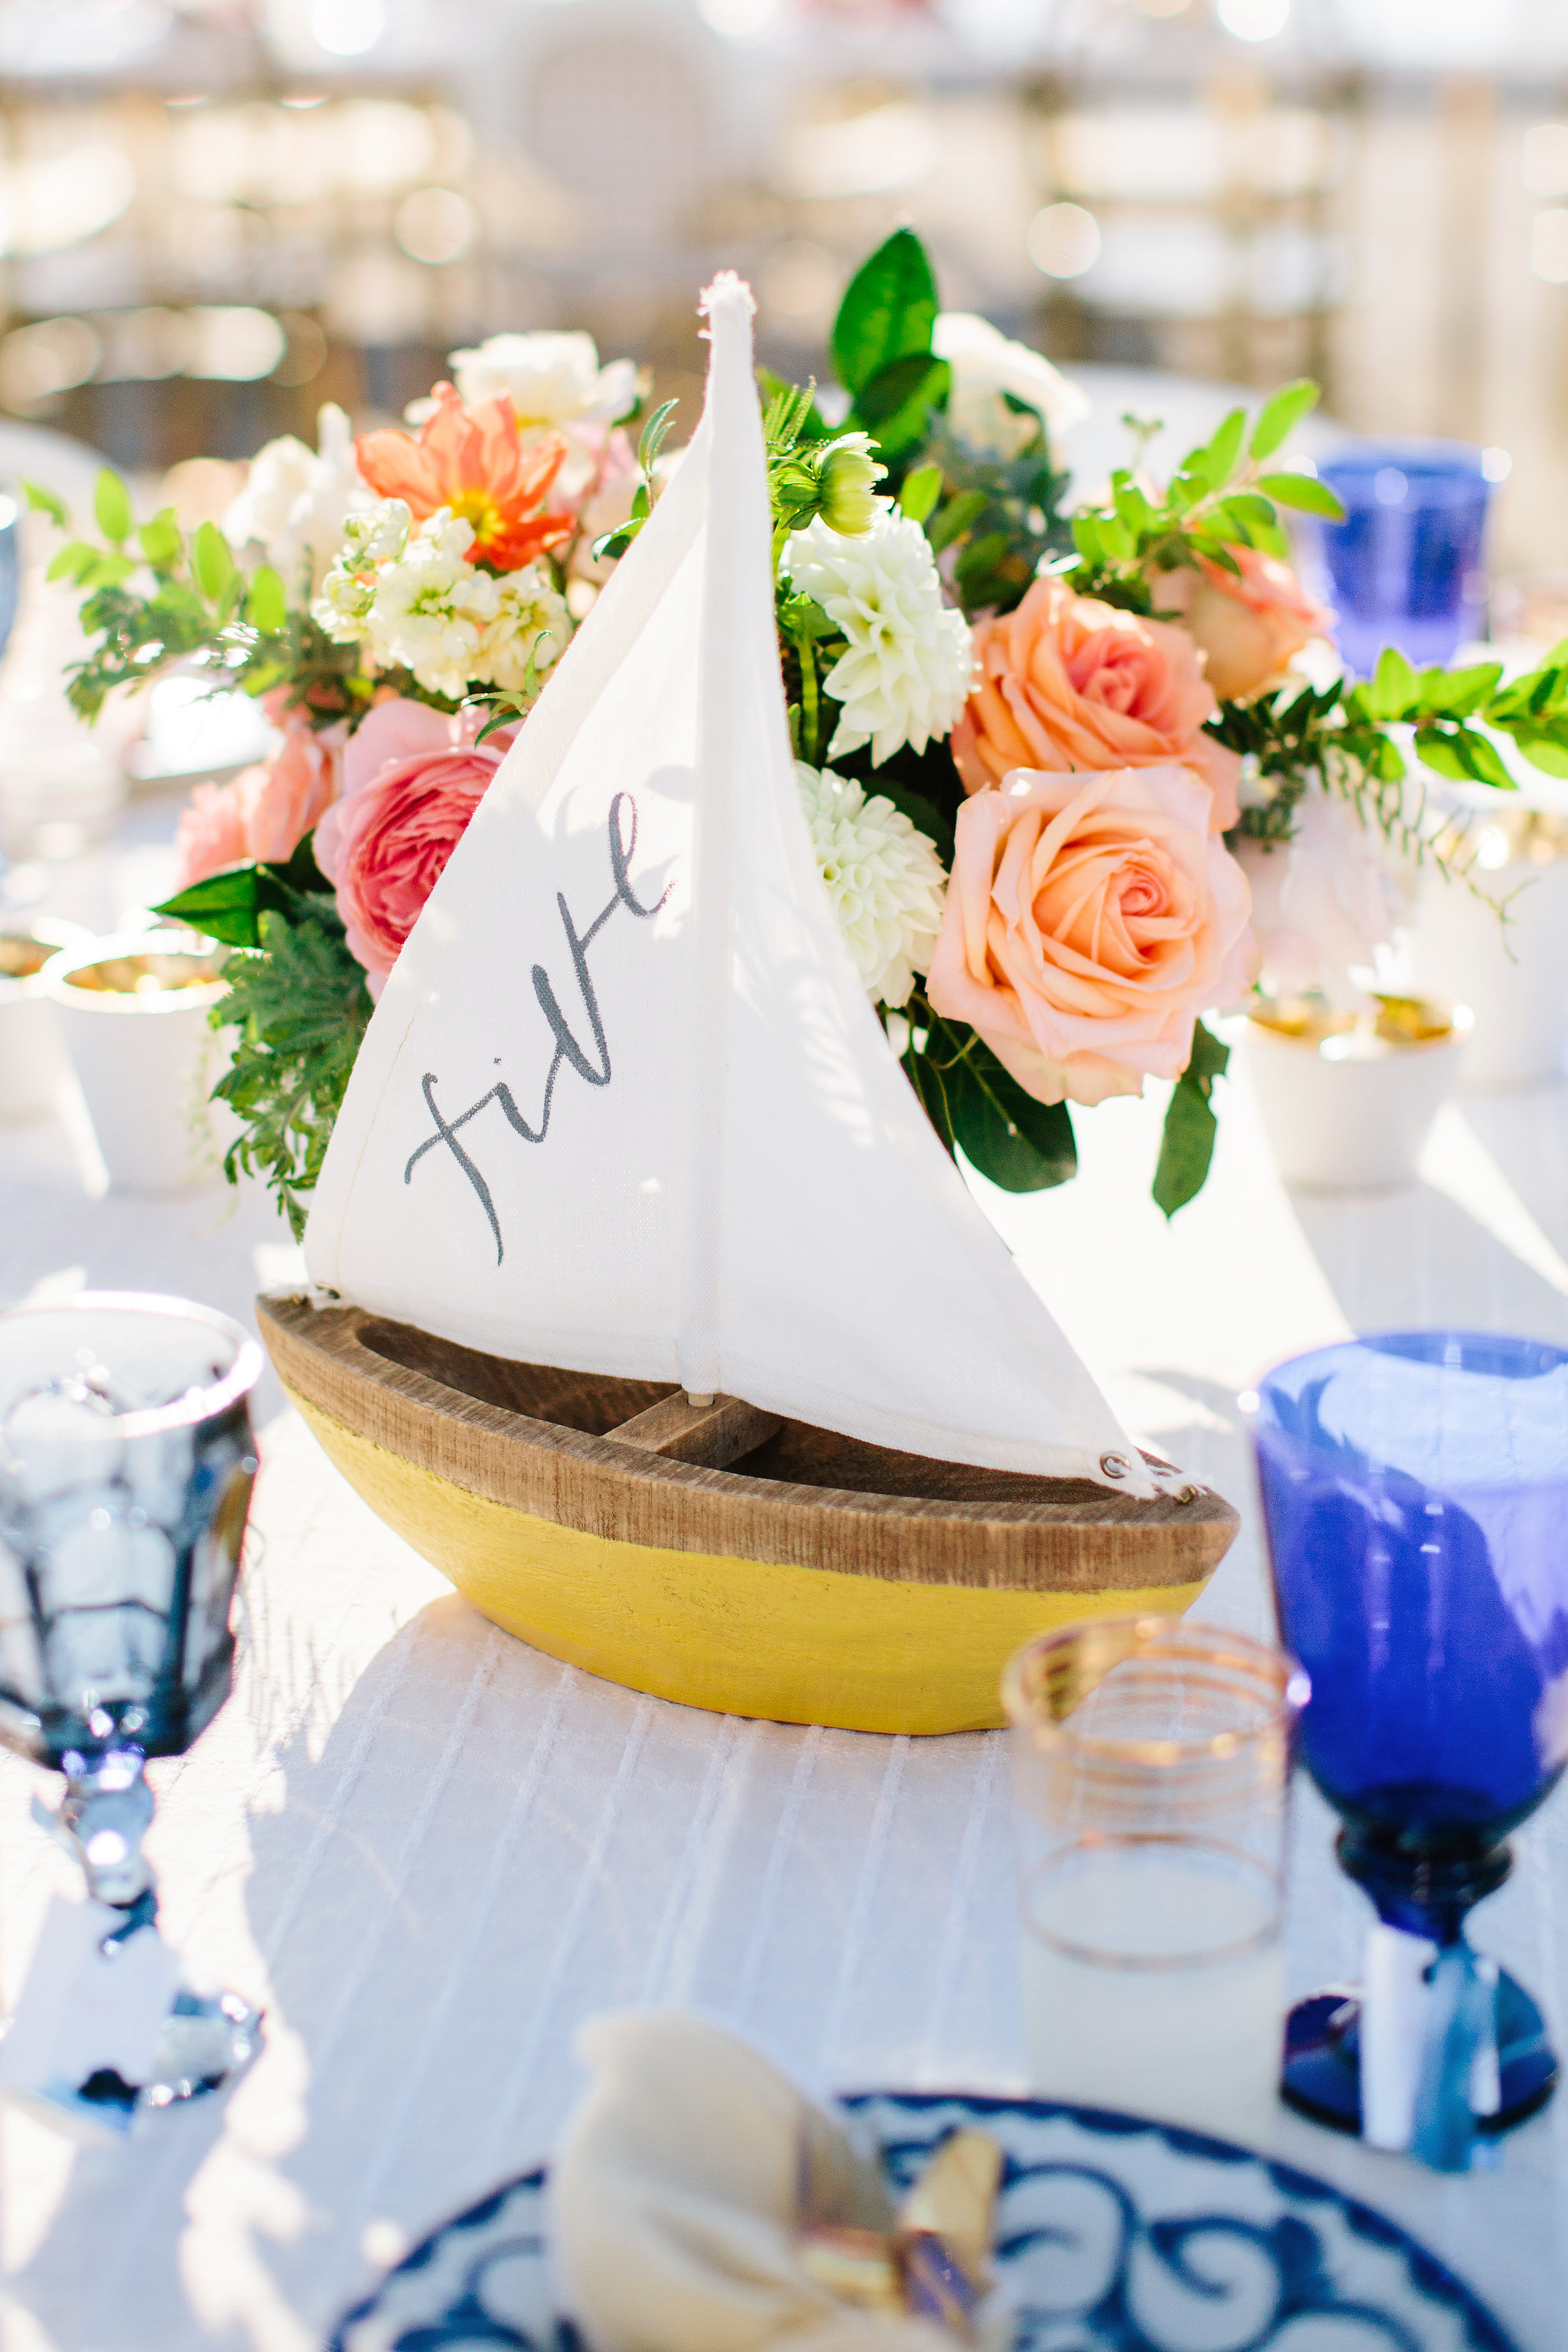 julie anthony real wedding table number sailboat